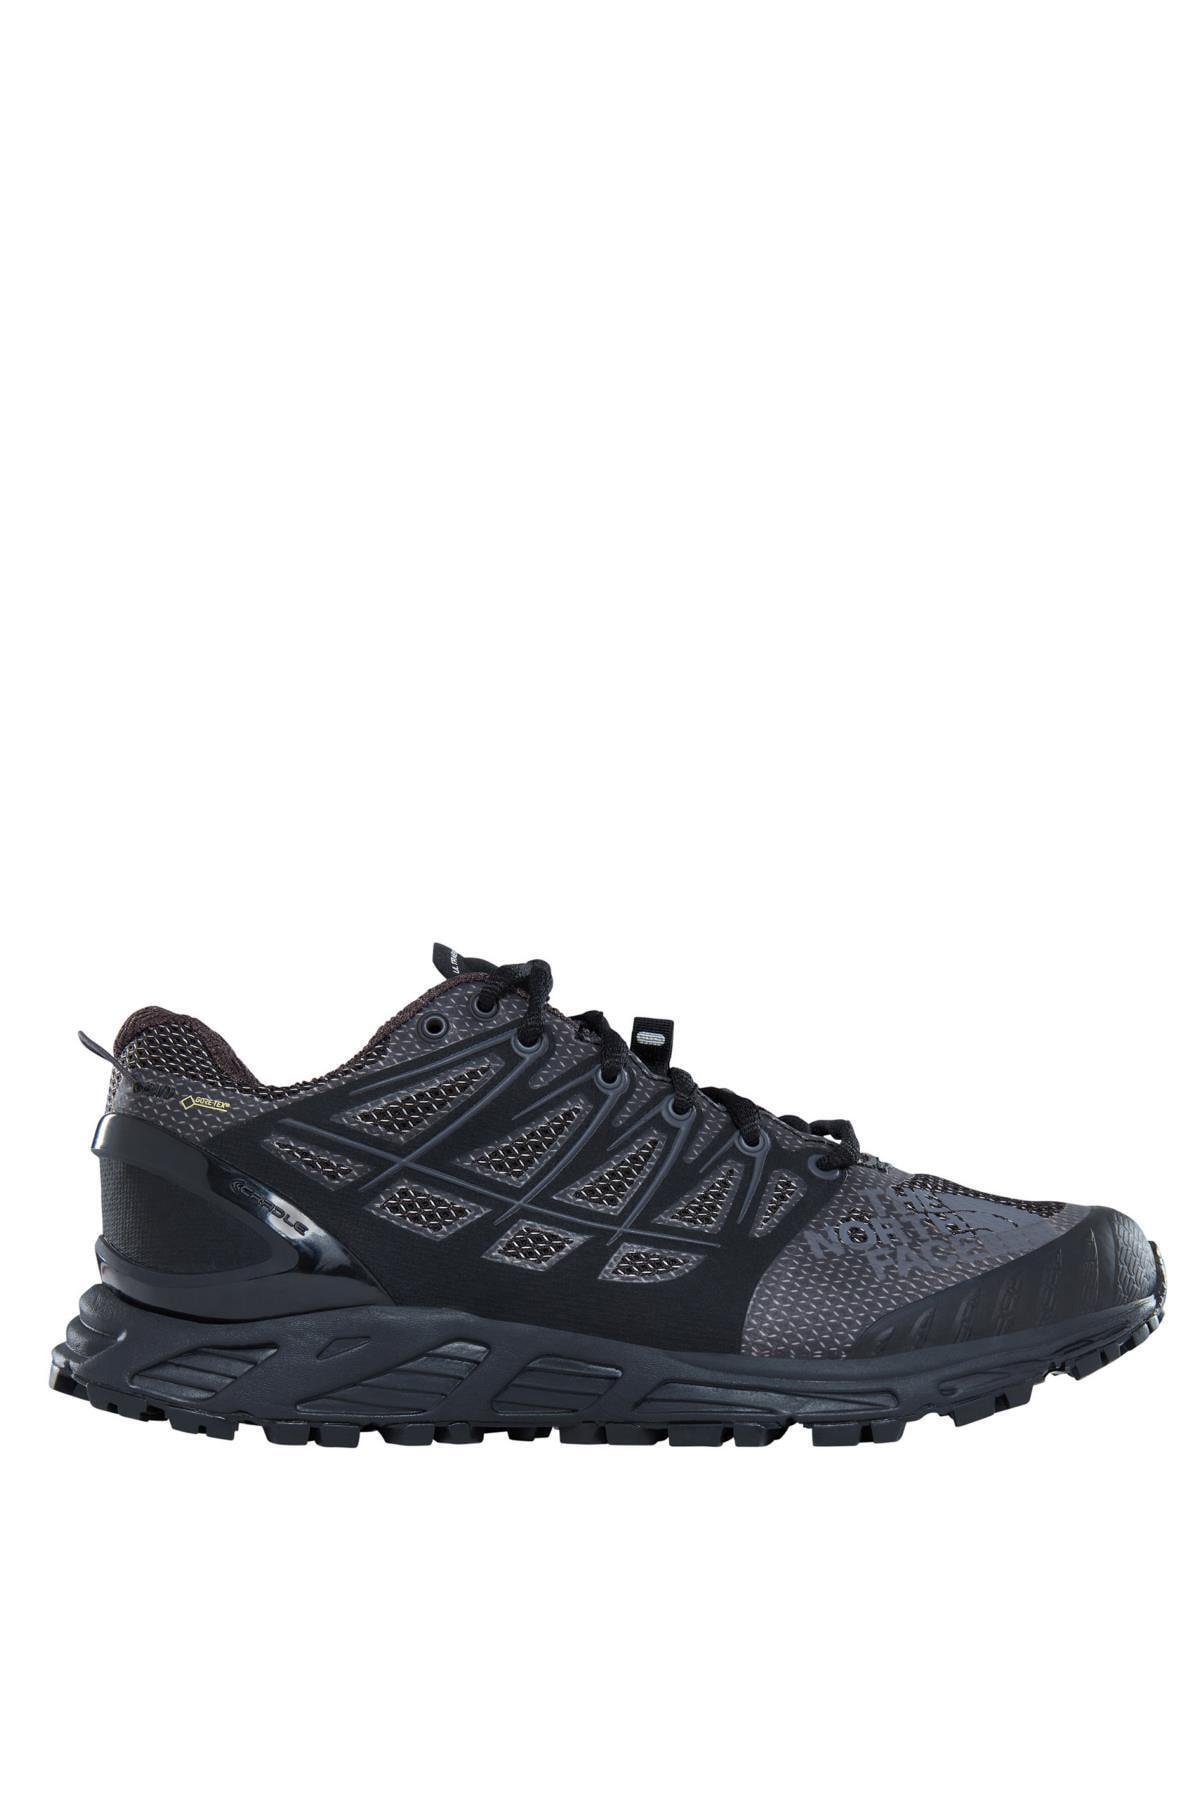 THE NORTH FACE Ultra Endurance 2 Gtx Kadın Ayakkabı Siyah 2